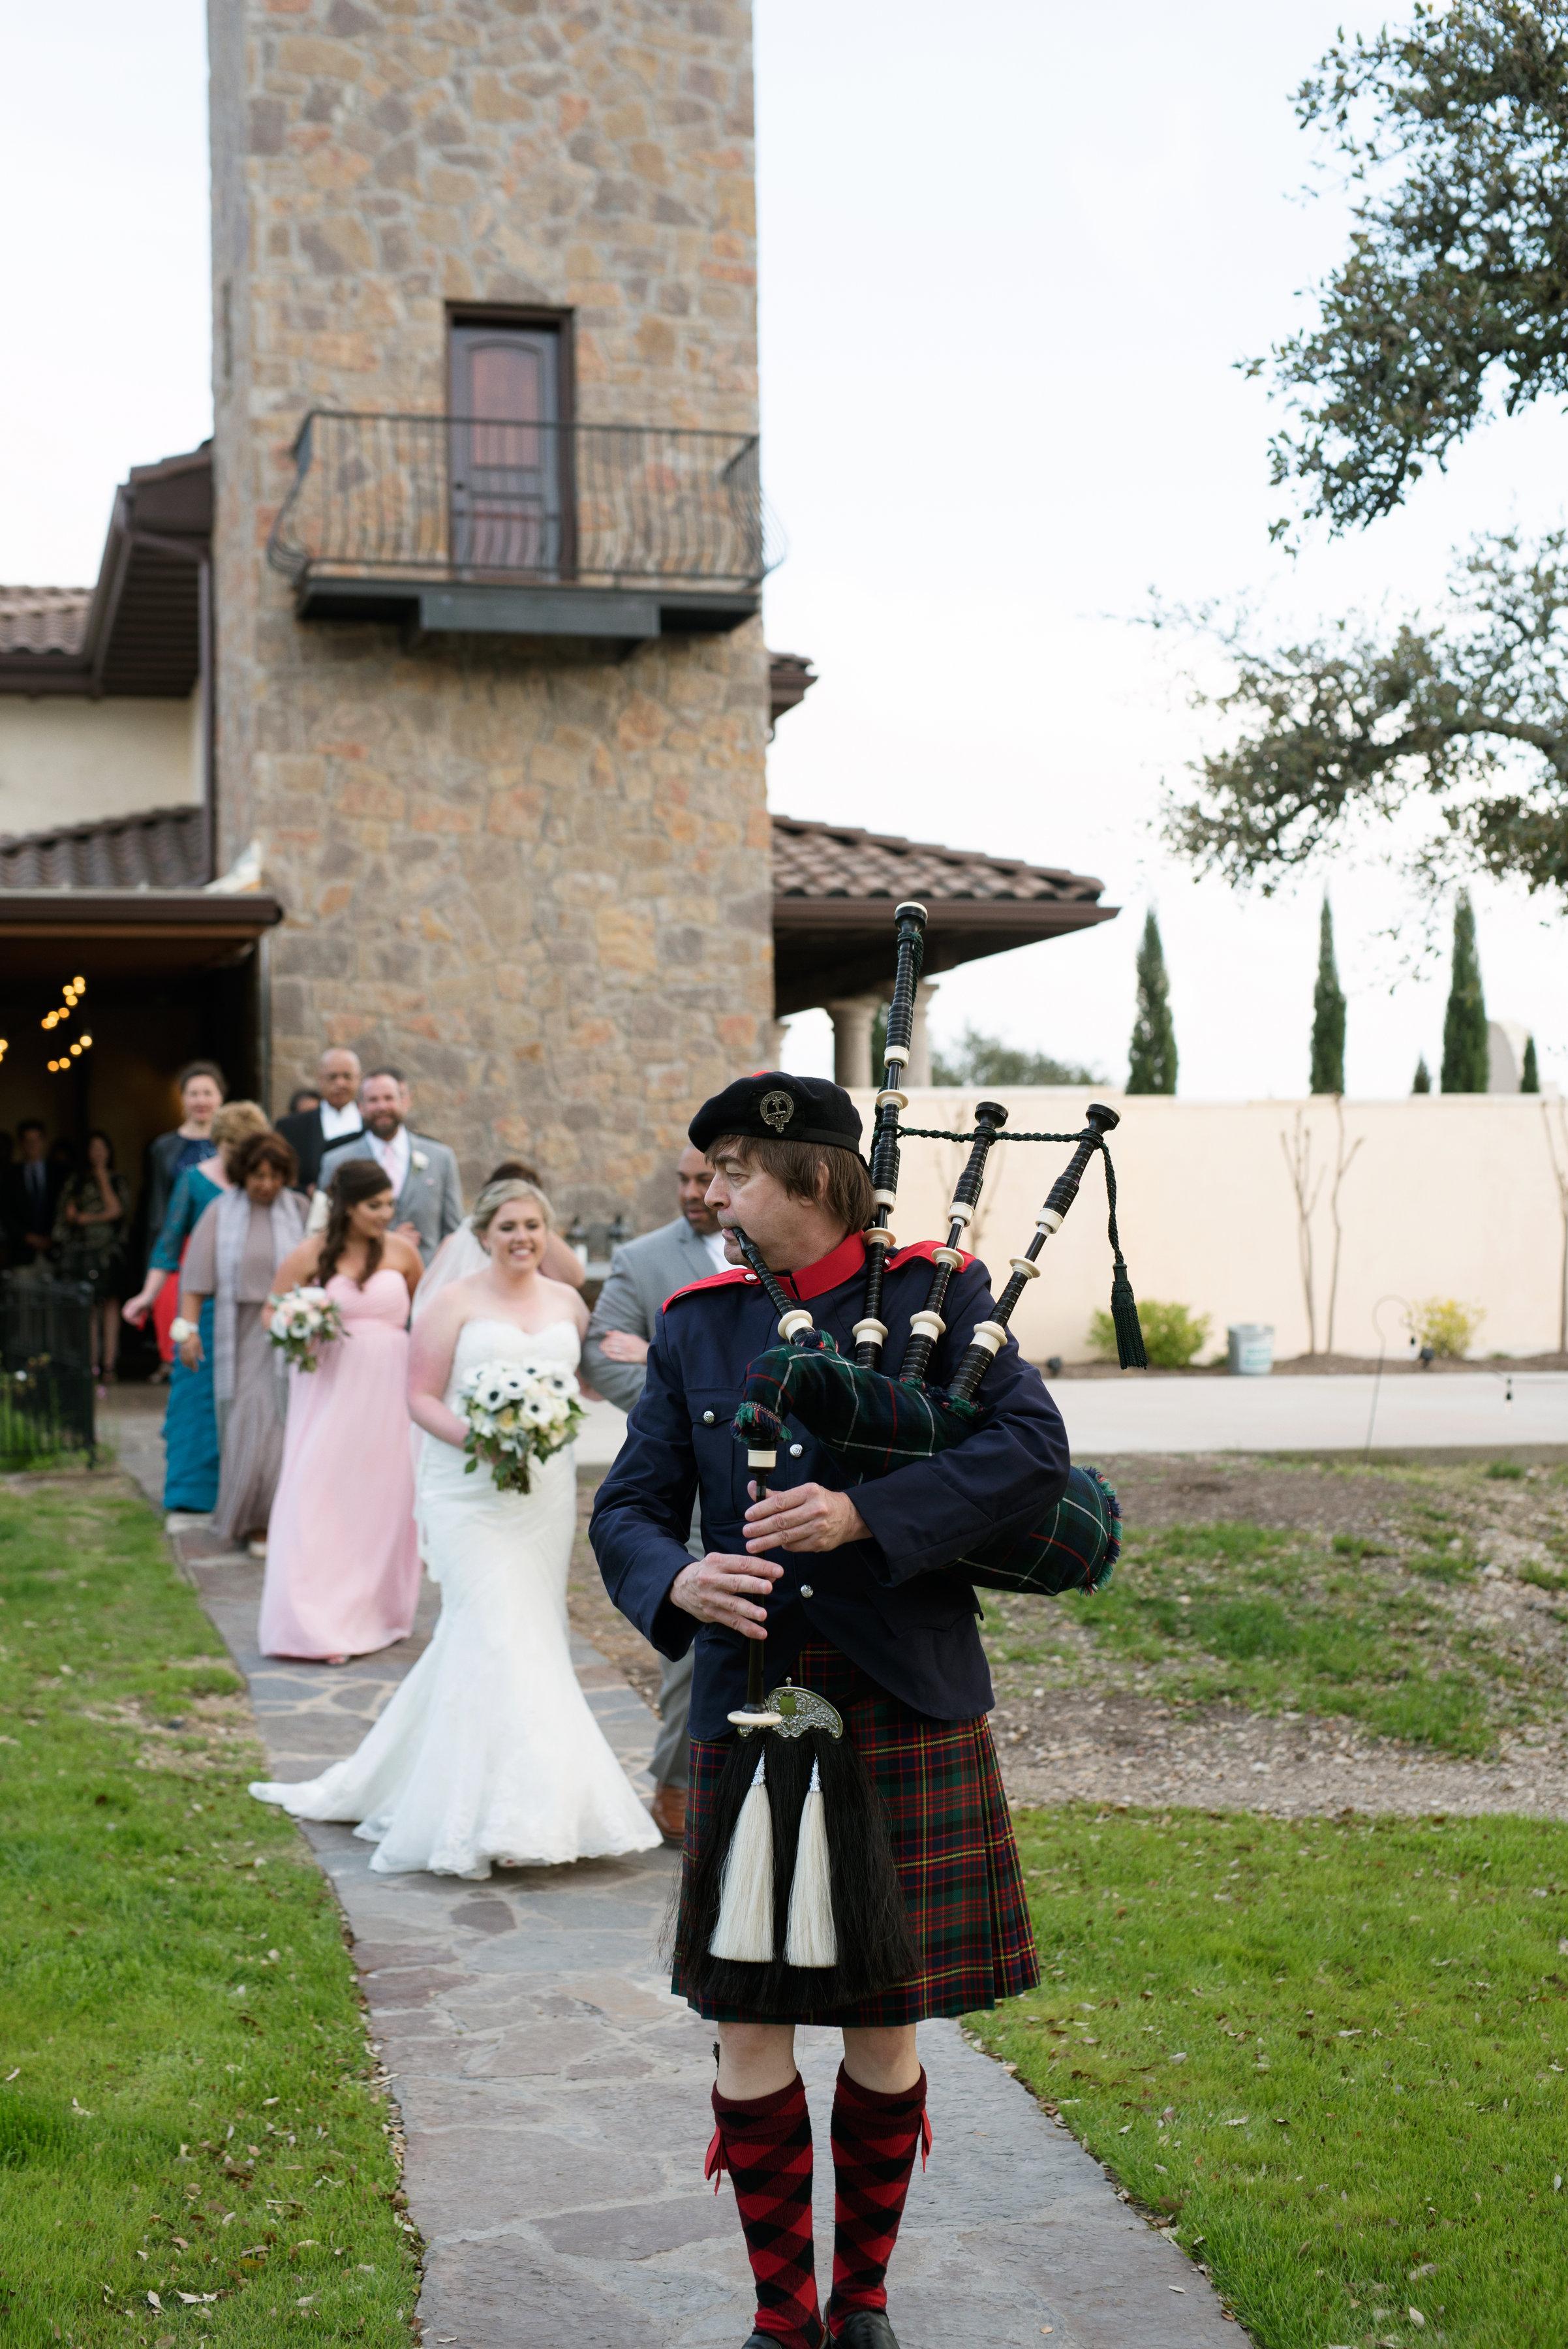 Ma Maison Austin Wedding Venue_ Austin Wedding Planner Heavenly Day Events _ Kristi Wright Austin Wedding Photographer20160306_0162.JPG